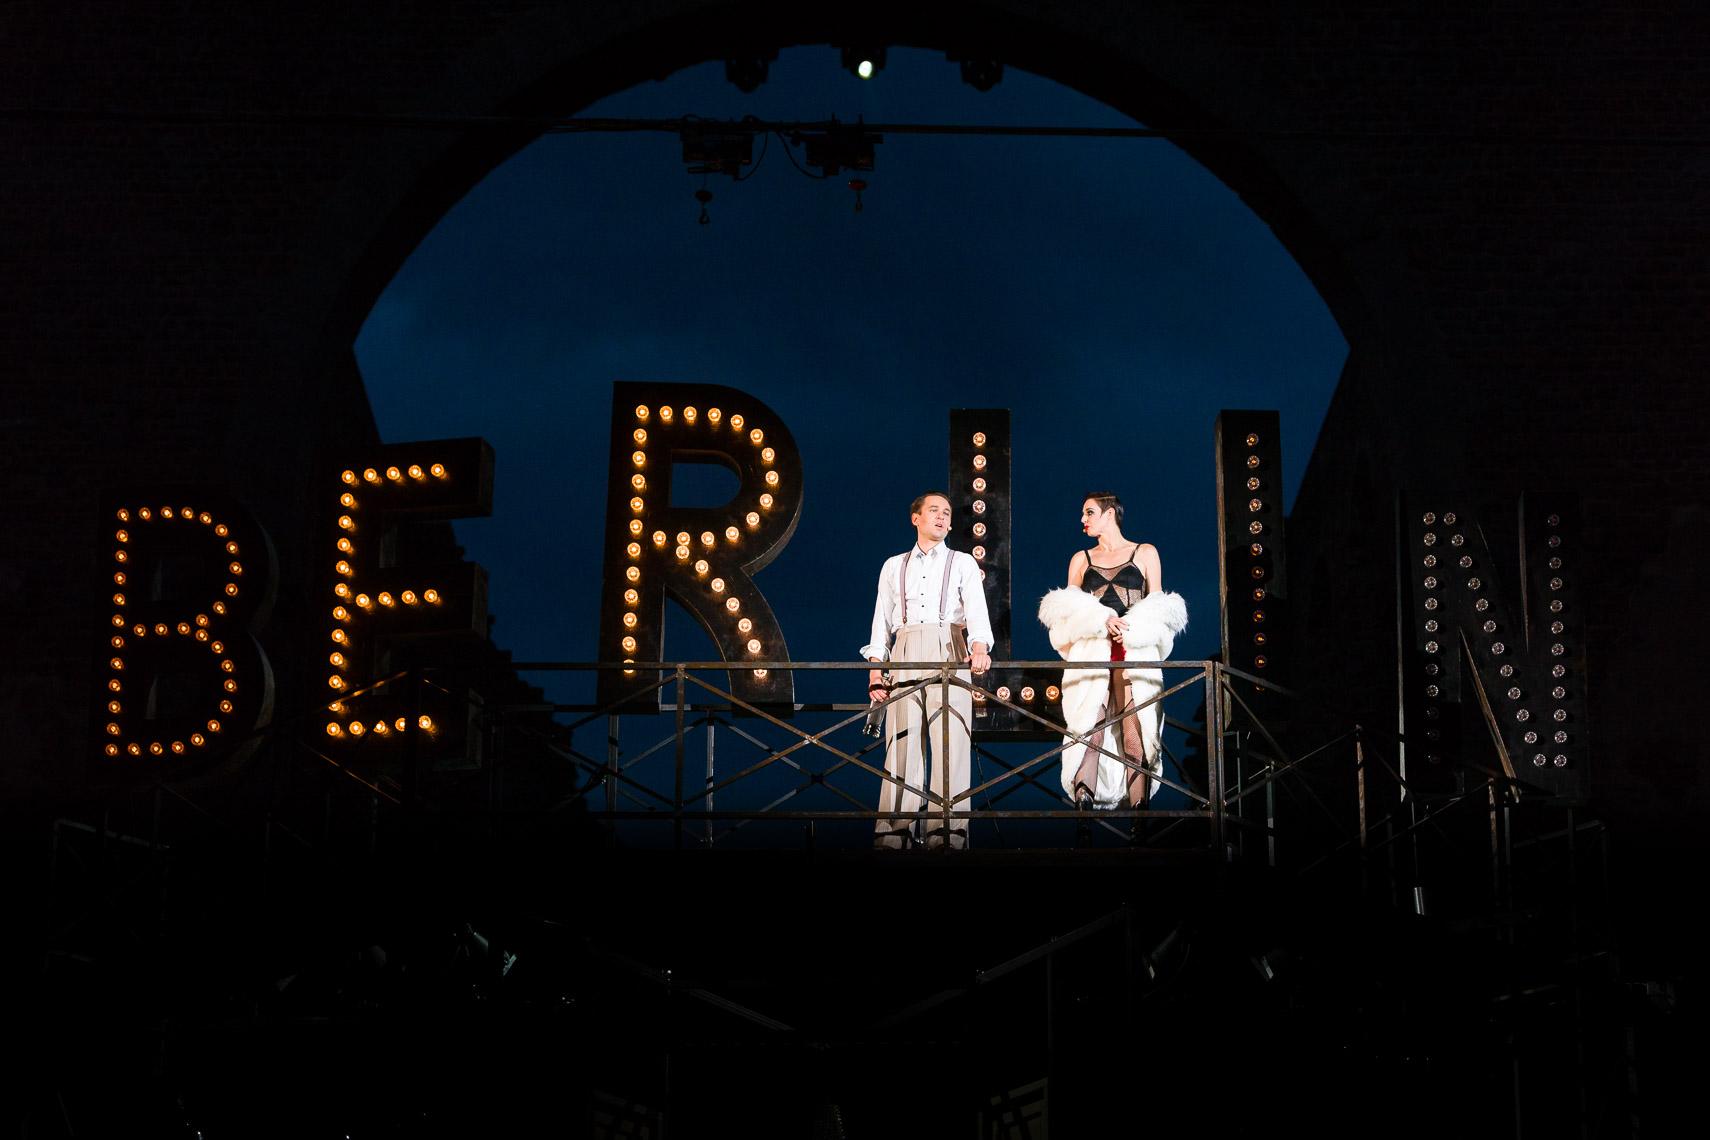 Musical Festival In Bad Hersfeld Karsten Socher Fotograf Und